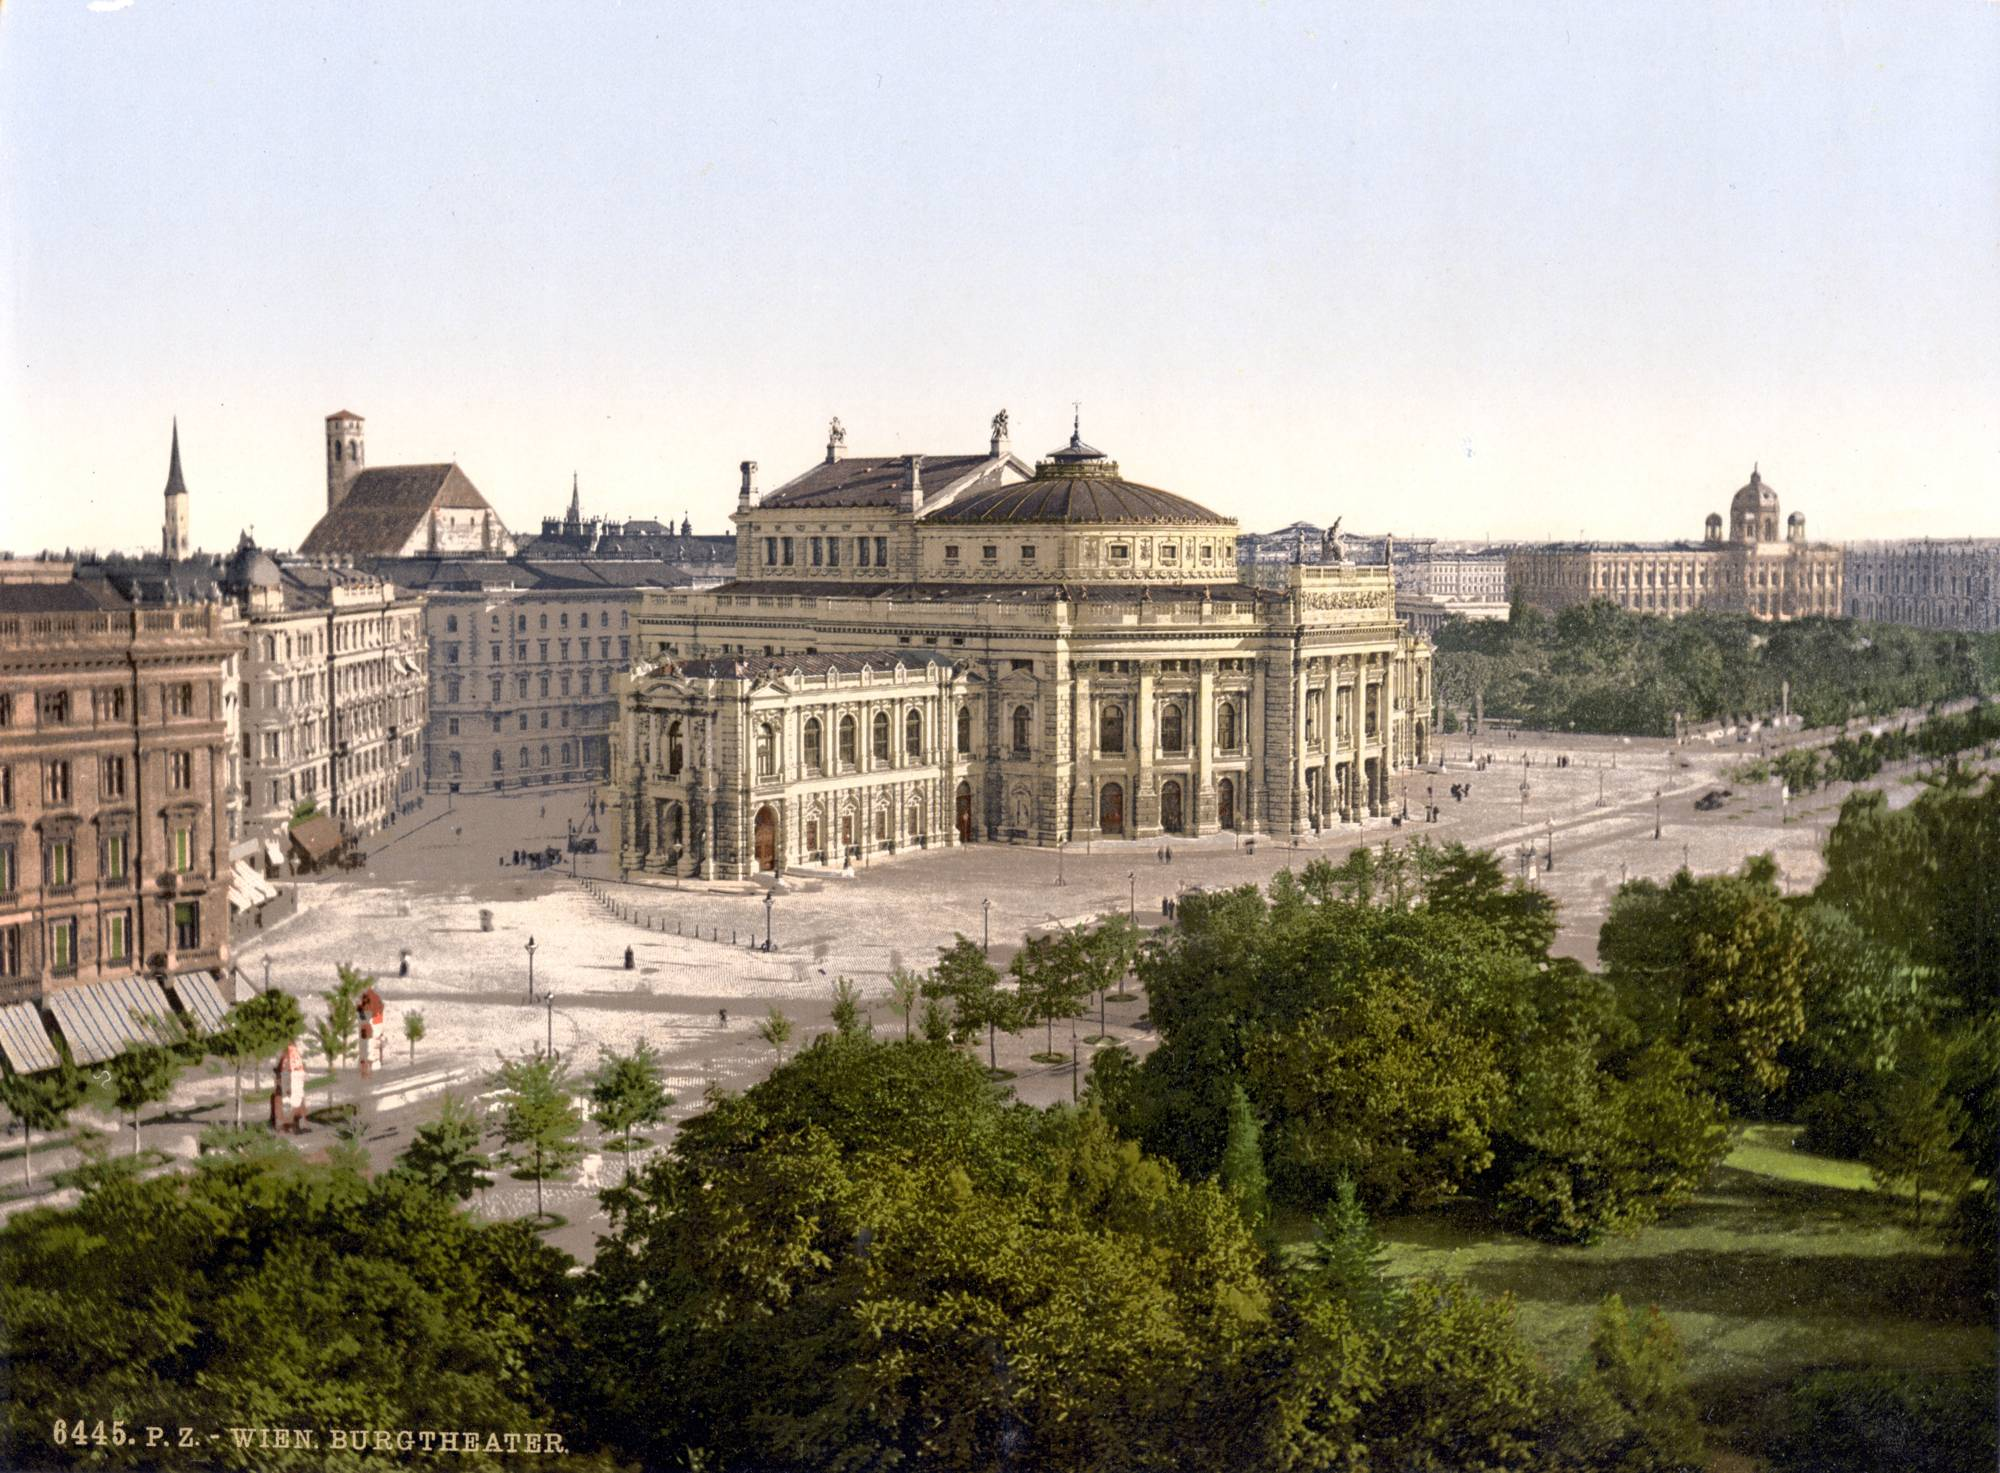 The Burgtheater around 1900